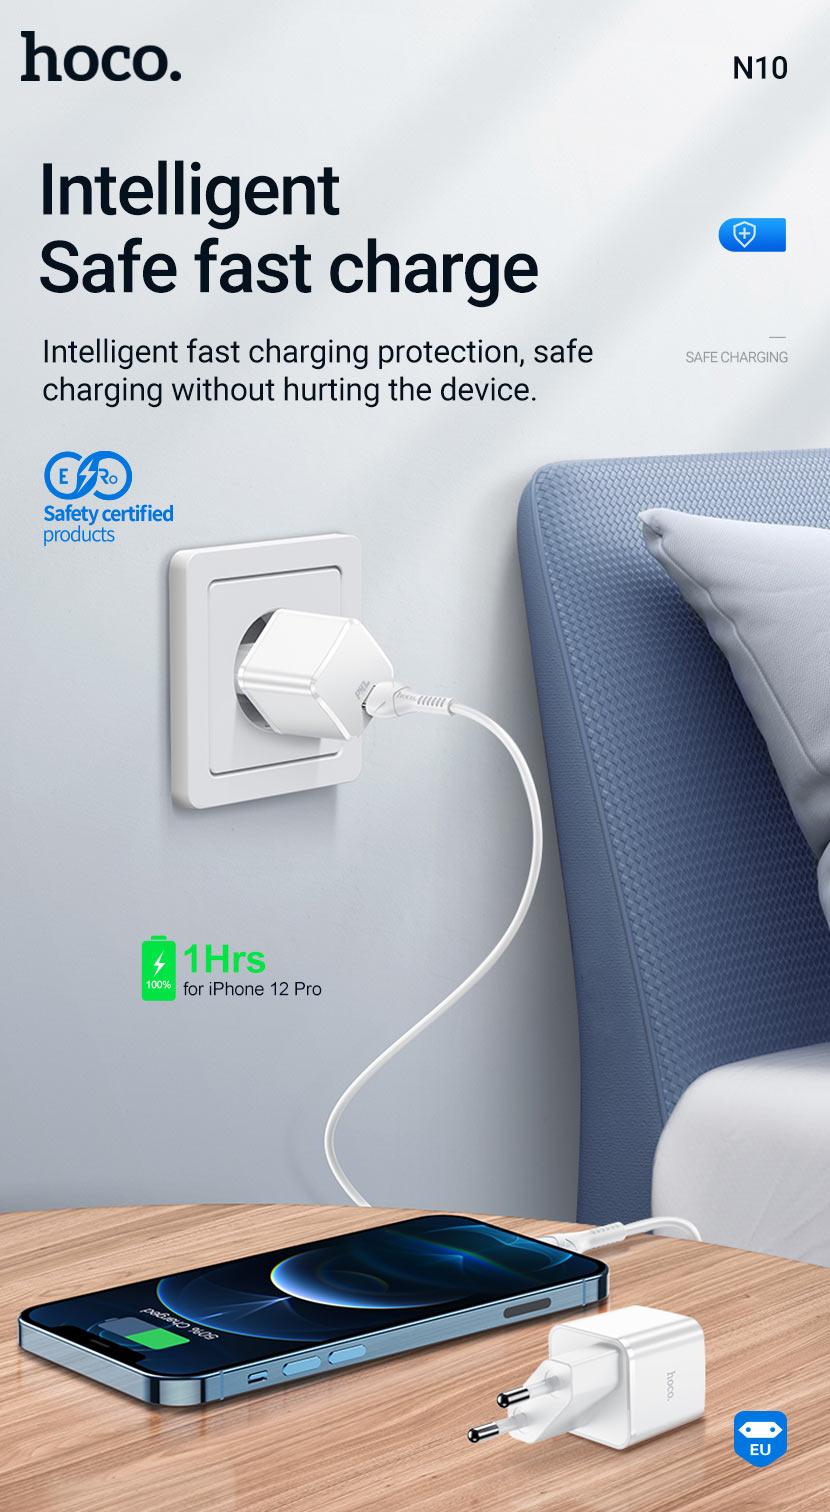 hoco news n10 n13 starter single port pd20w wall charger safe en